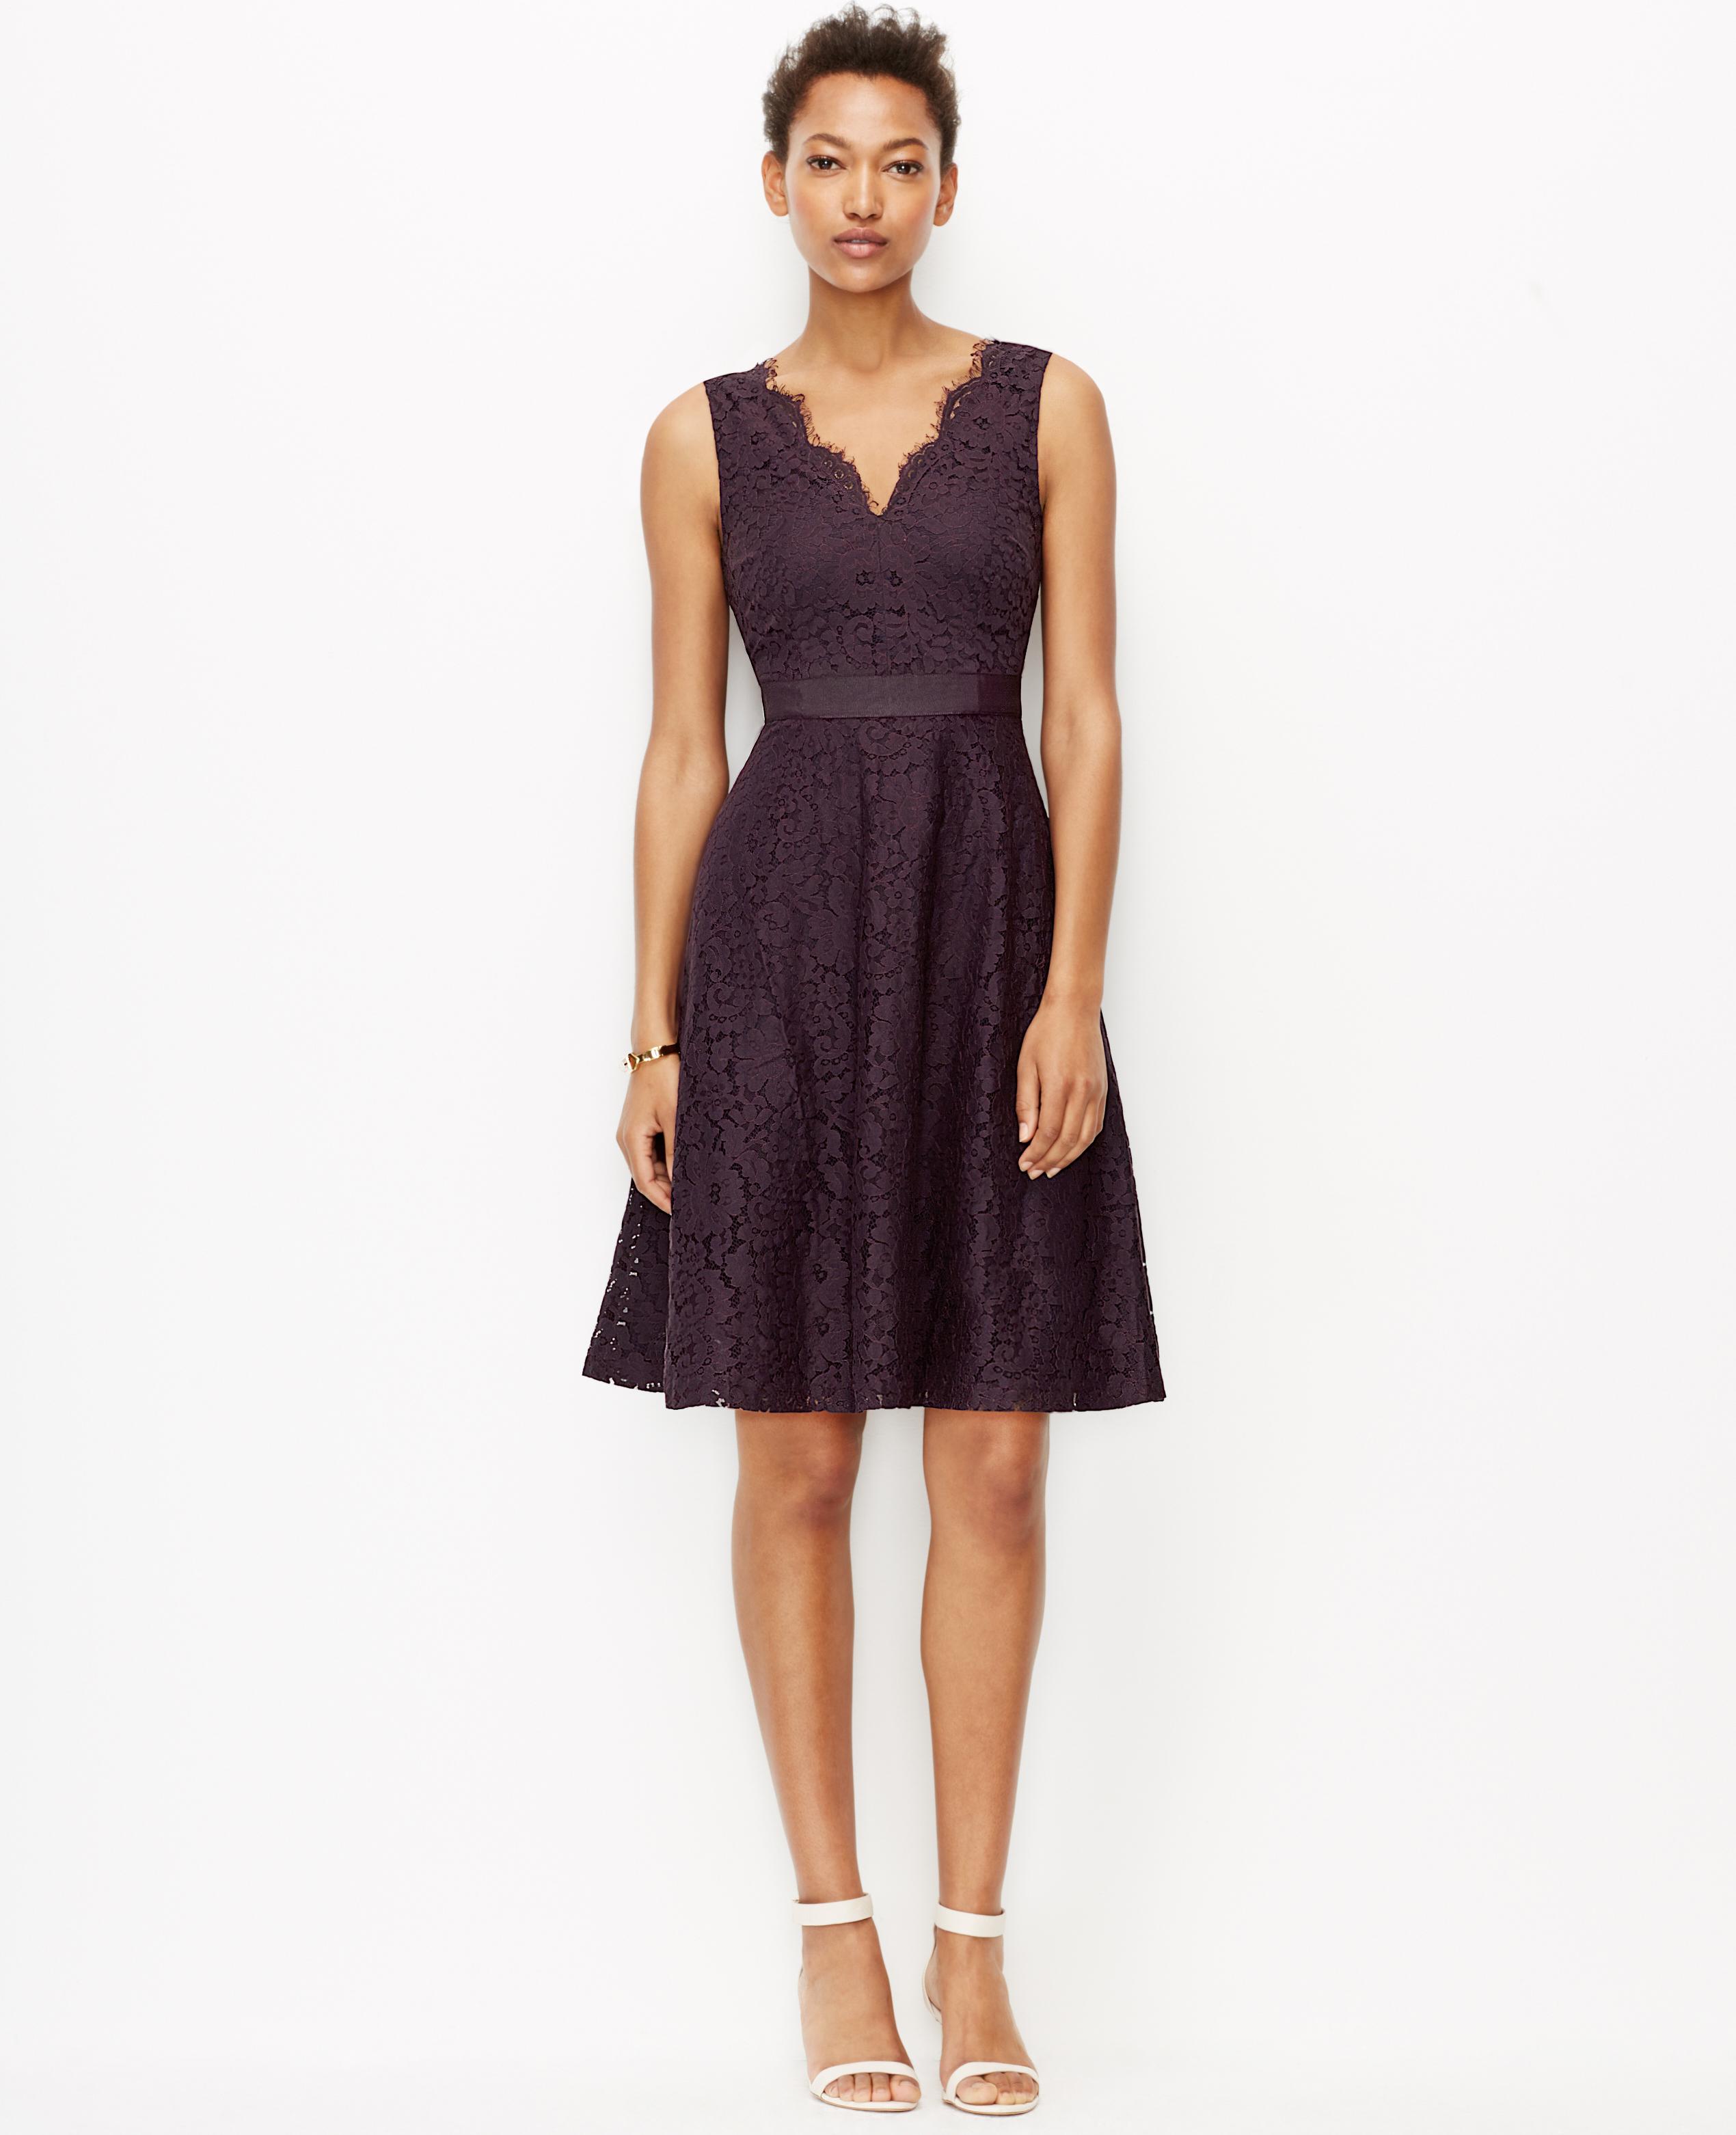 84d65e324500 Ann Taylor Petite Scalloped Lace Dress in Purple - Lyst